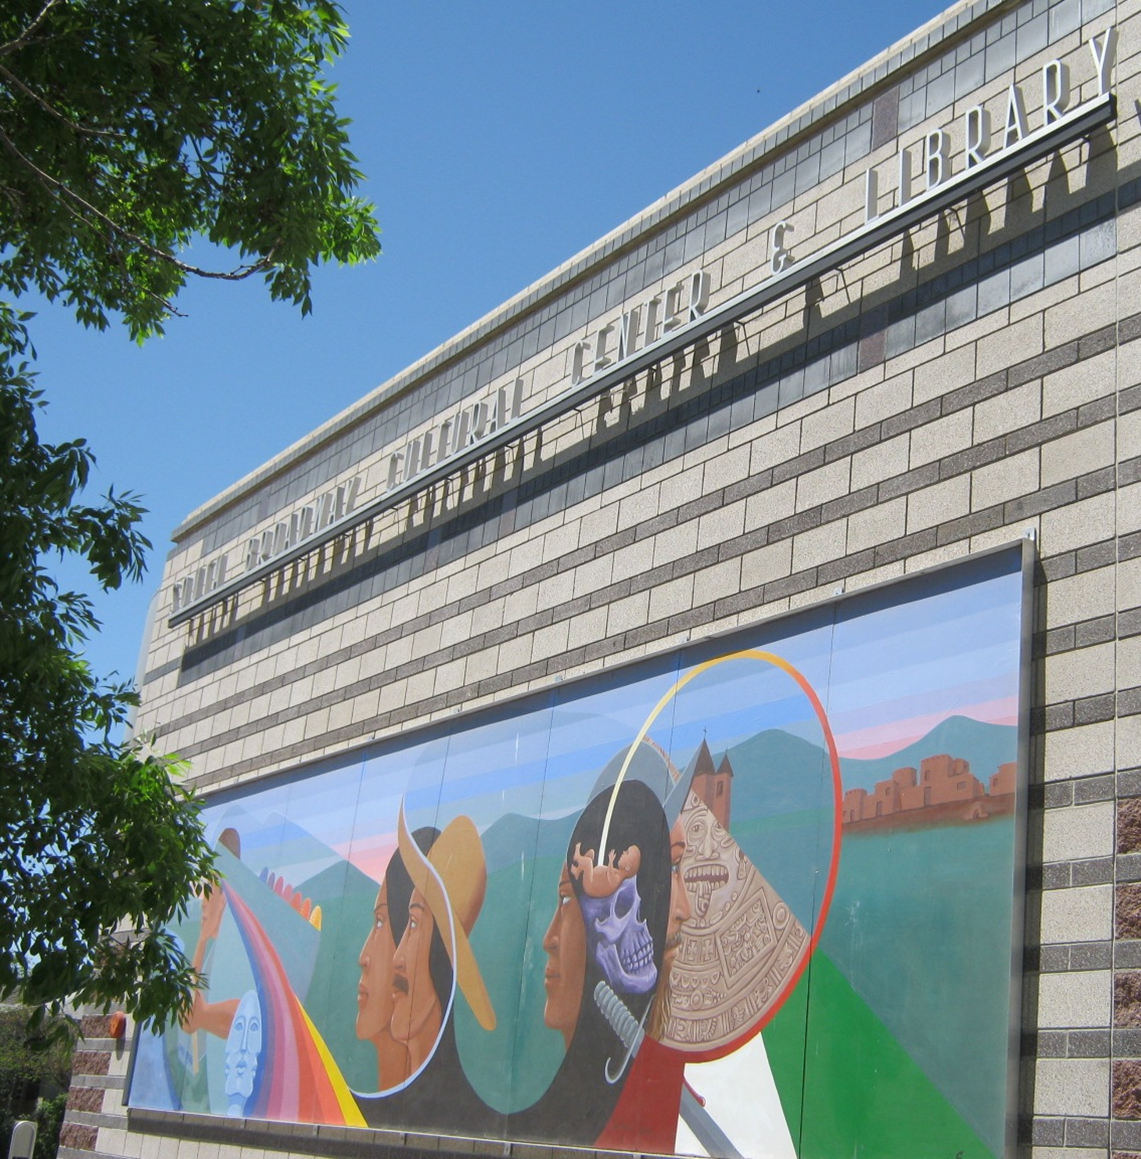 South Broadway Cultural Center, Albuquerque N.M.